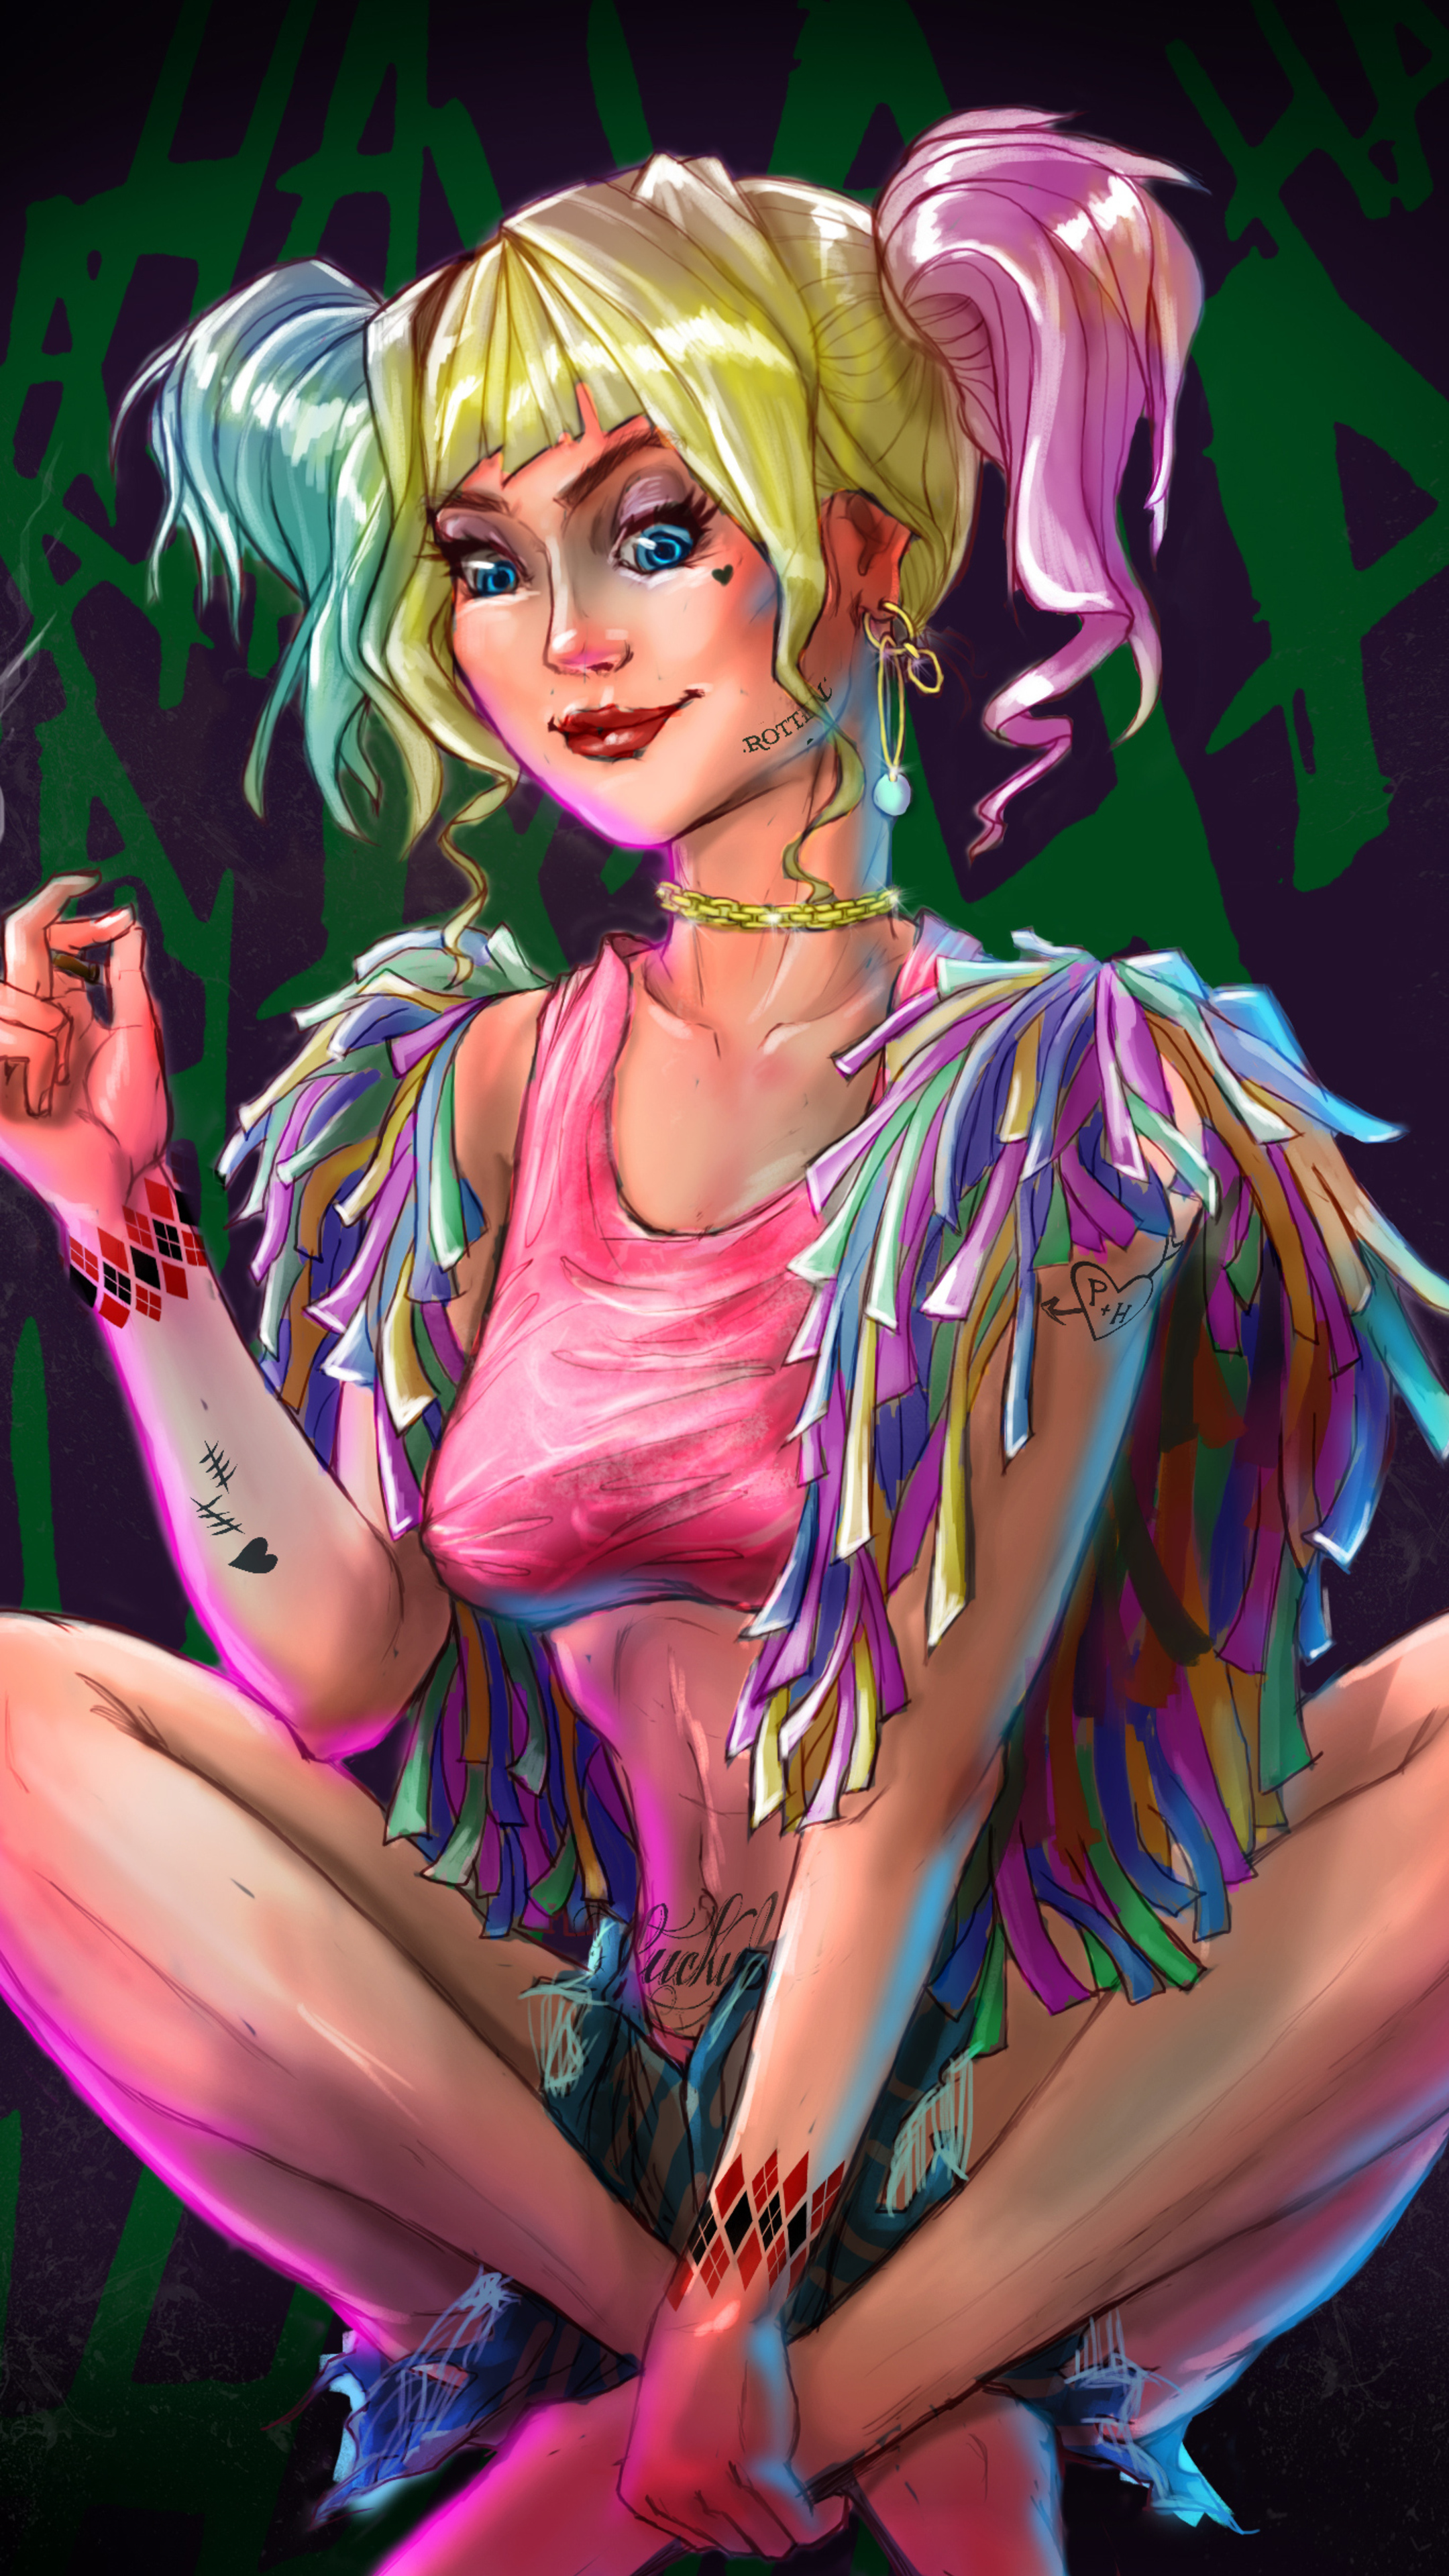 2160x3840 Harley Quinn Anime Artwork Sony Xperia X,XZ,Z5